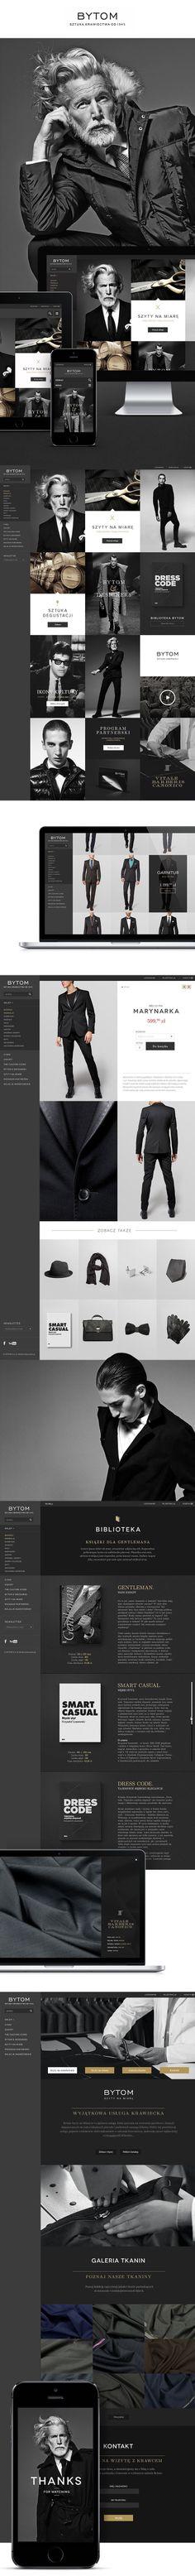 Bytom - art of tailoring since 1945 by Michał Młodożeniec, via Behance Web Design, Layout Design, Graphic Design, Ui Web, Behance, Branding, Digital, Board Ideas, Profile